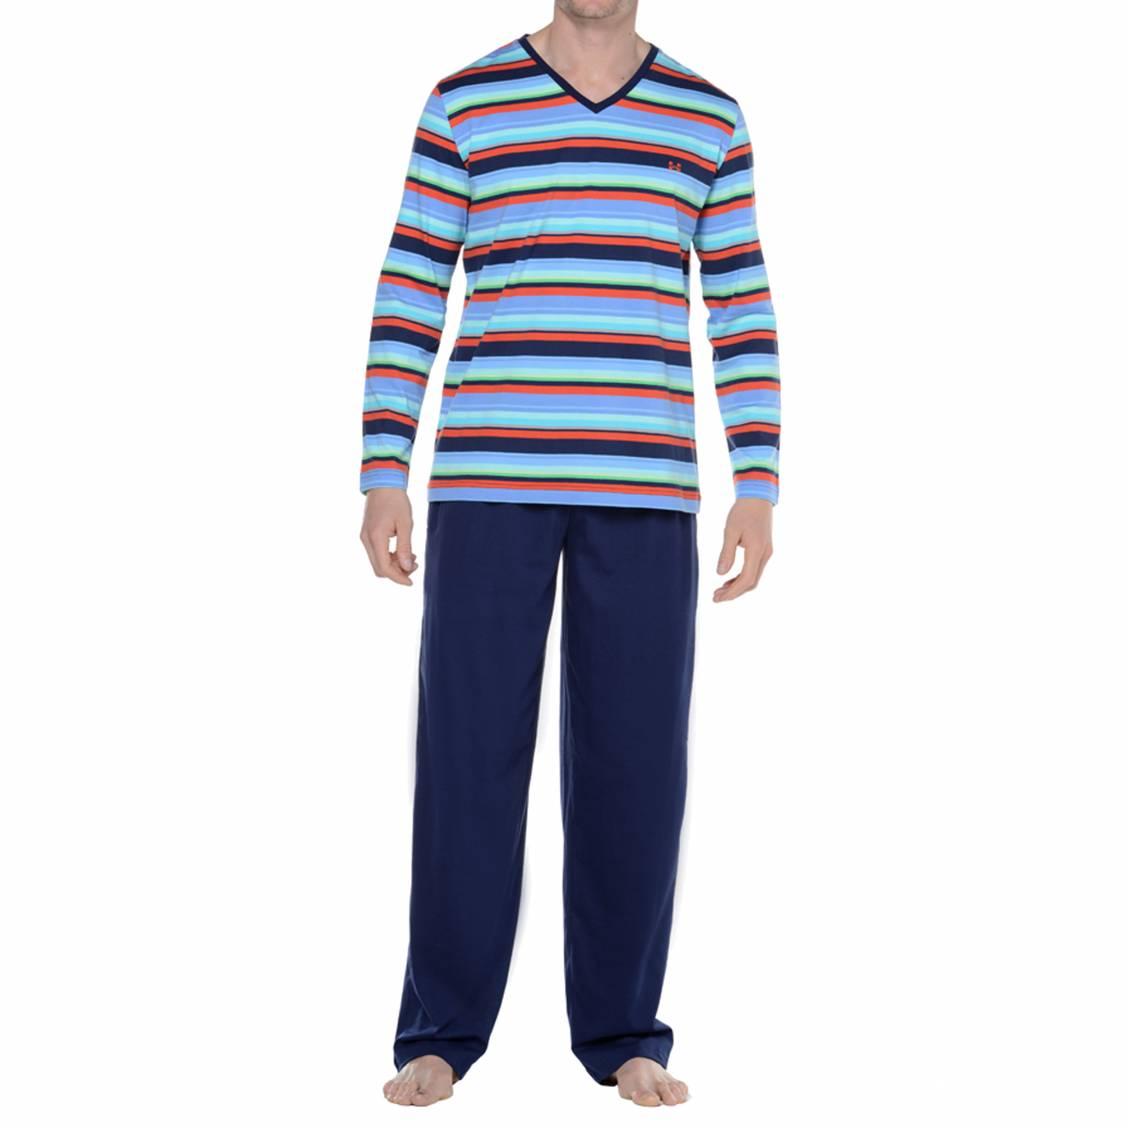 pyjama homme hom bleu marine rayé